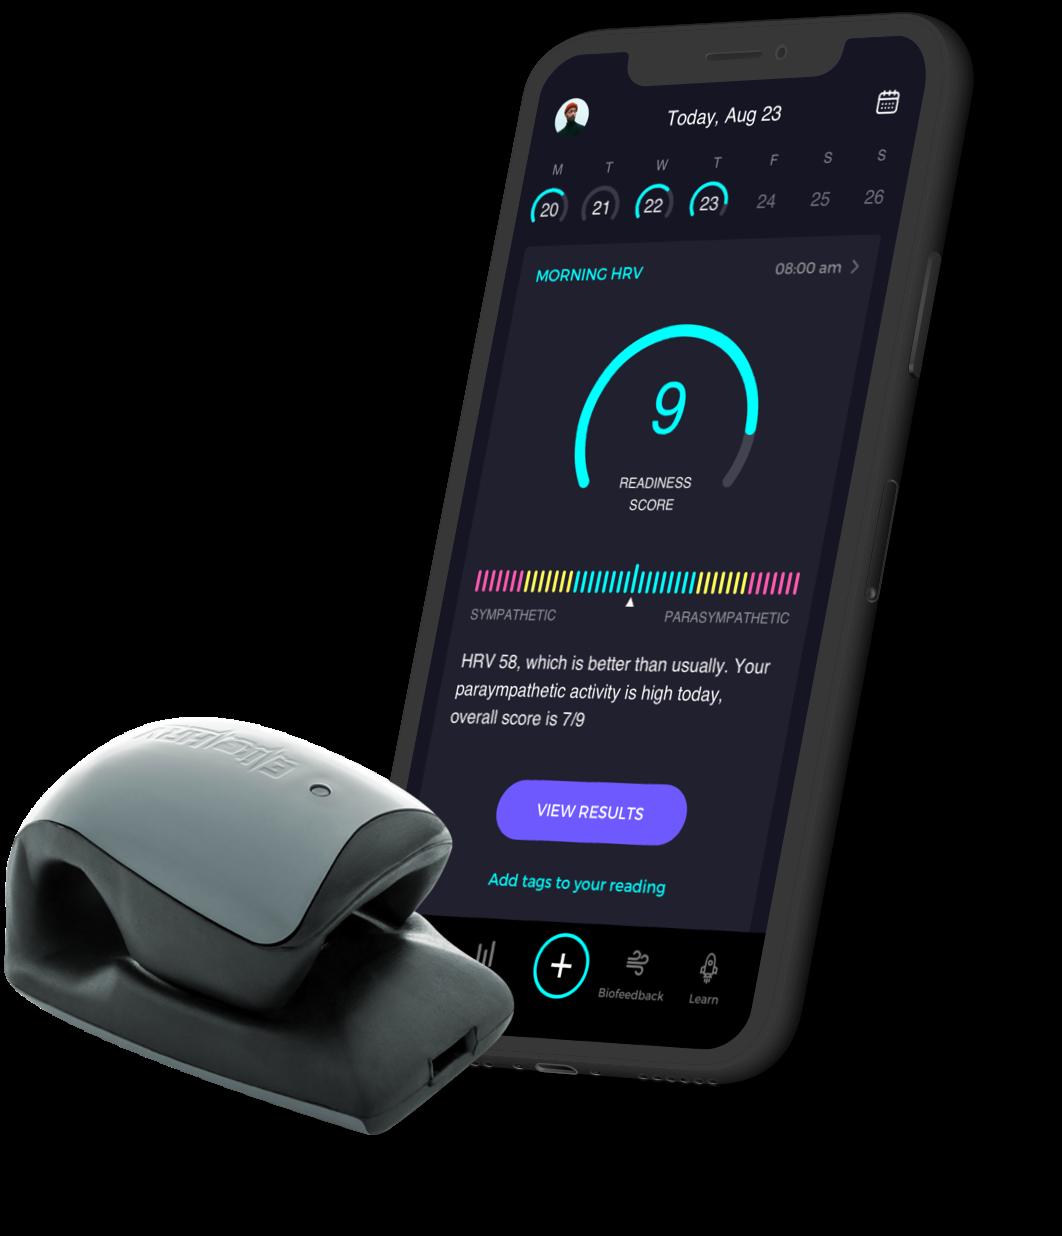 Elite HRV: The Best Heart Rate Variability Monitor & App